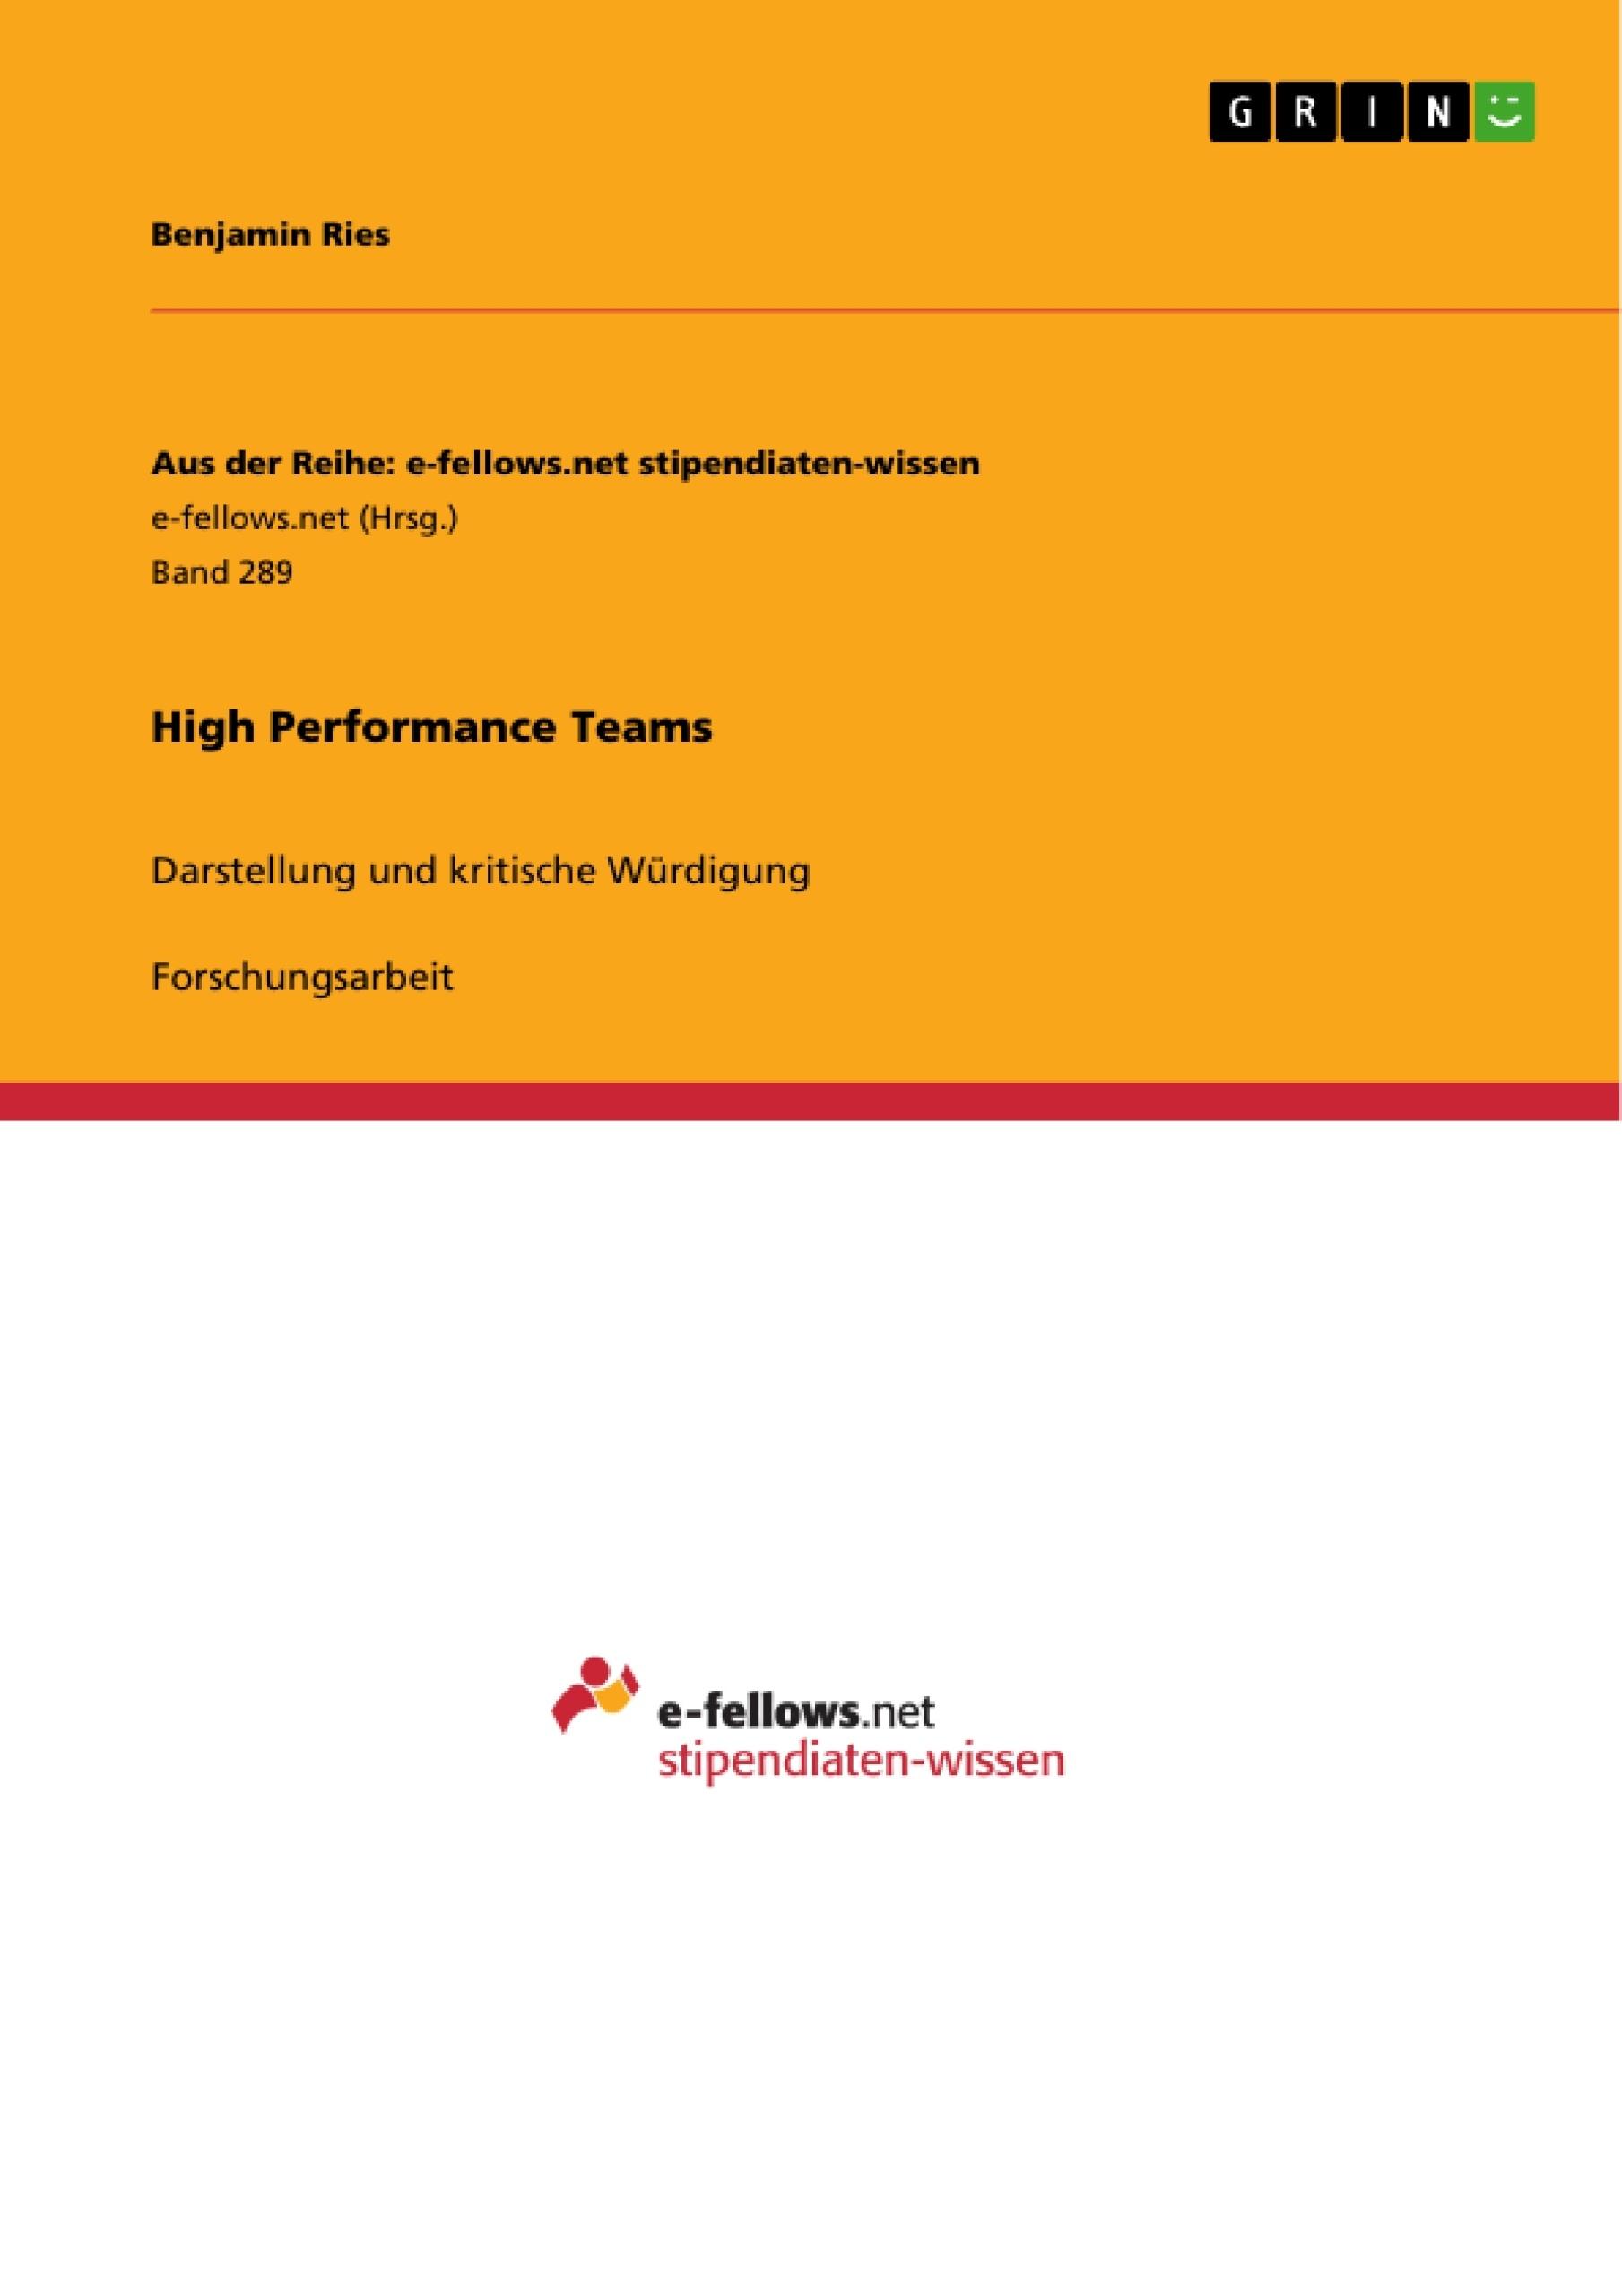 High Performance Teams Diplomarbeiten24de